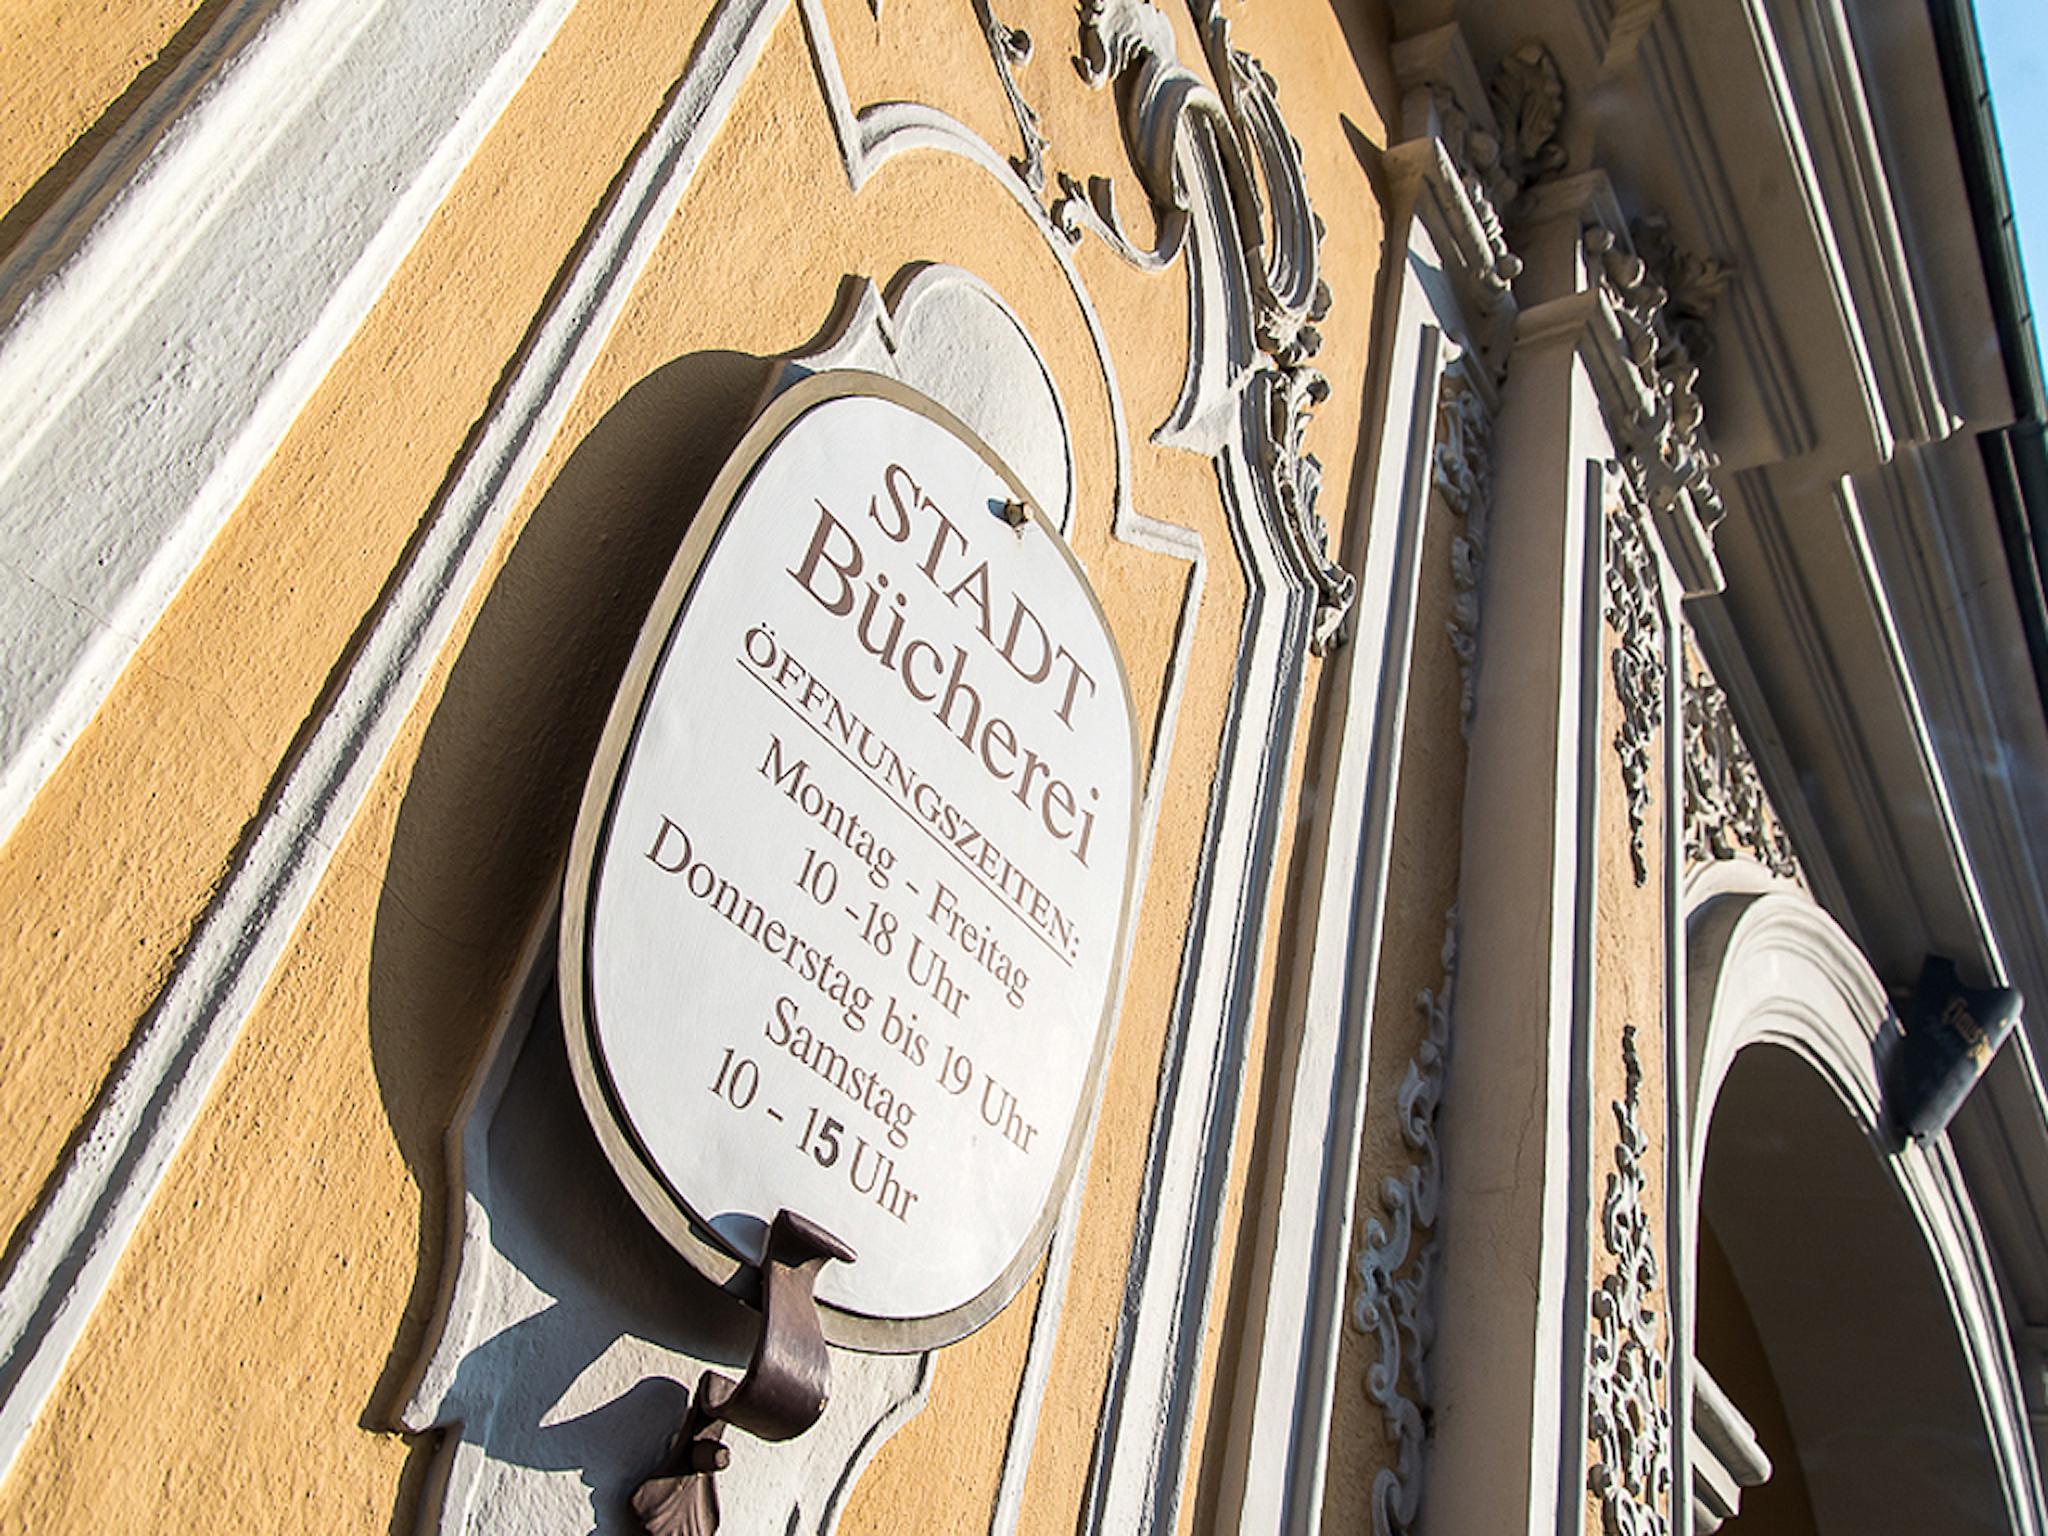 Stadtbücherei im Falkenhaus. Foto: Pascal Höfig